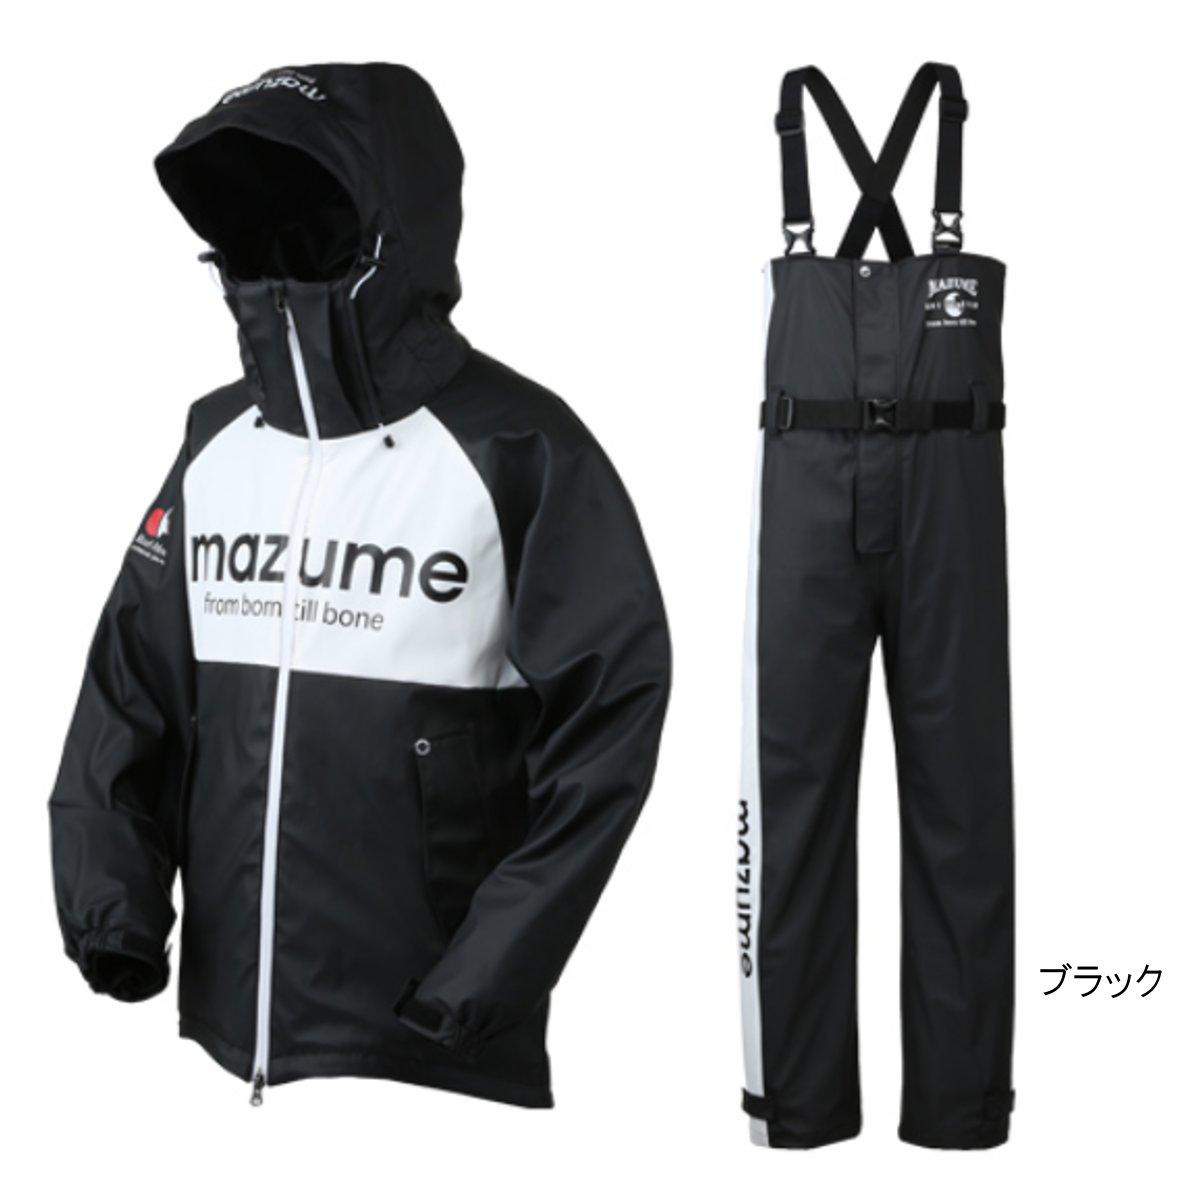 mazume ROUGH WATER レインスーツ II MZRS-383 L ブラック【送料無料】